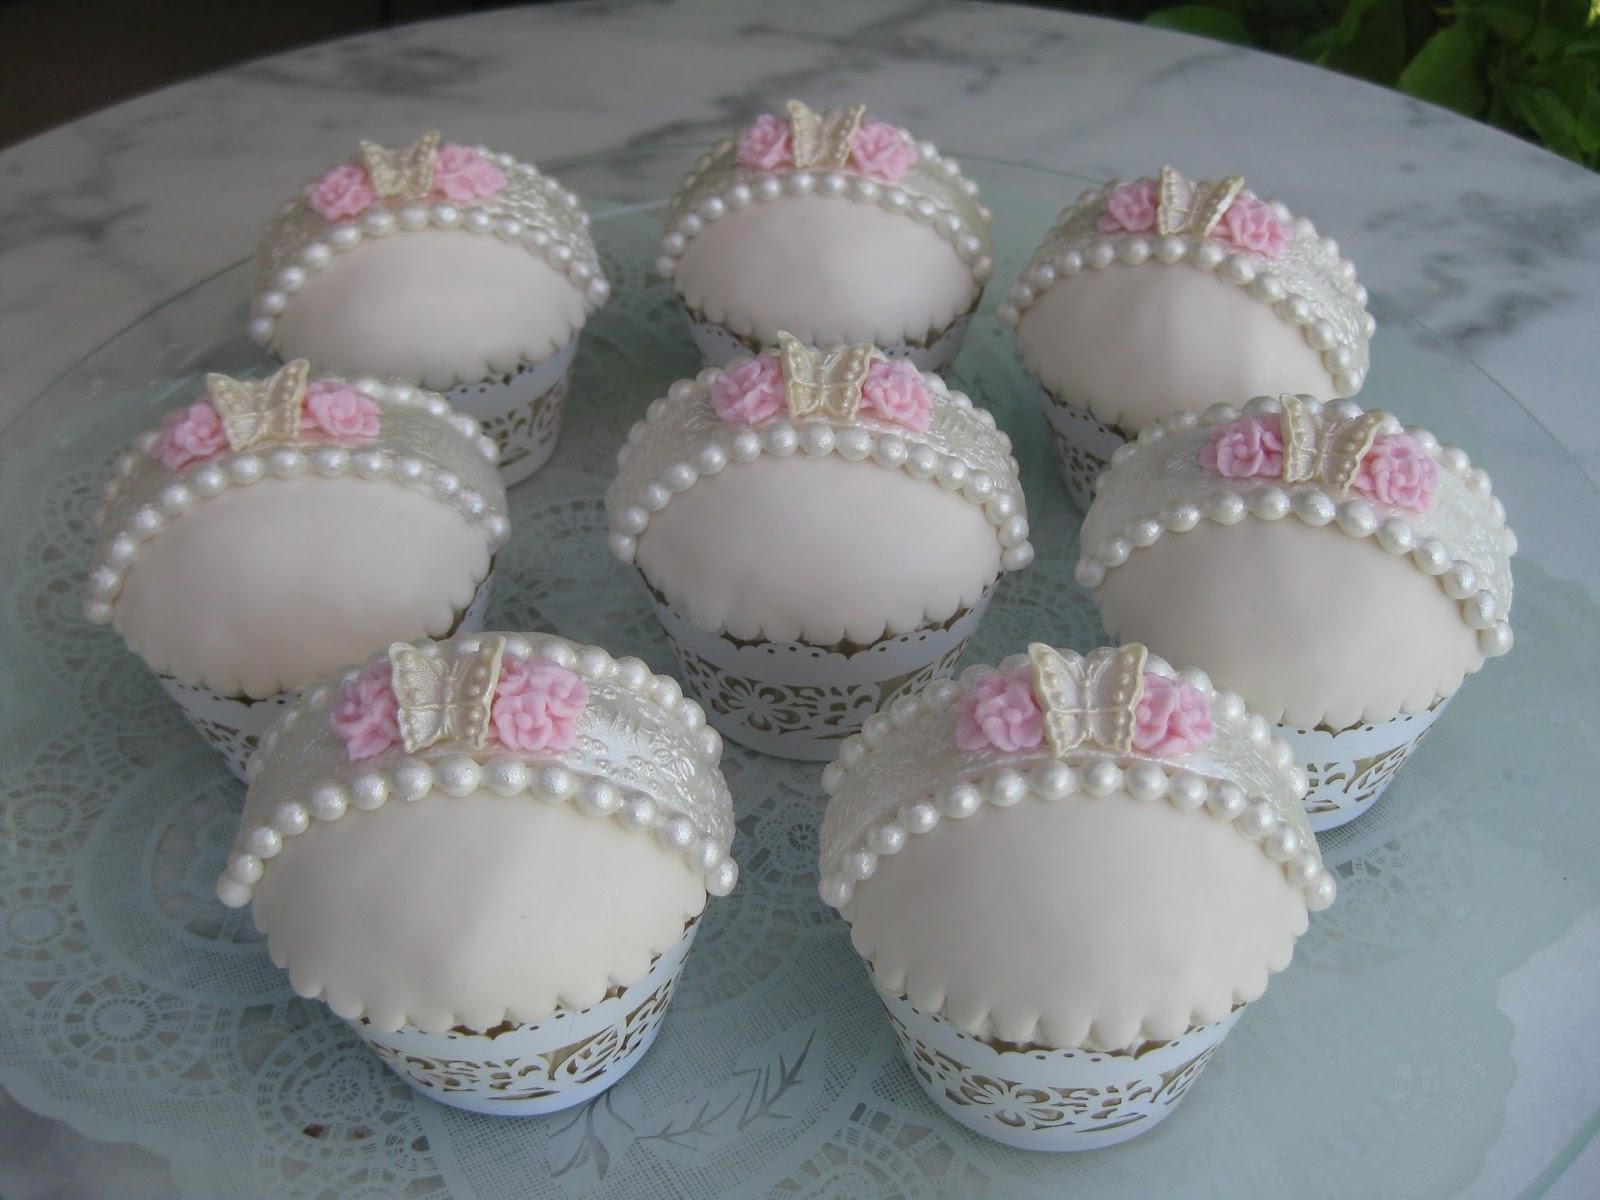 Bridal Shower Cupcakes  Sugar Chef BRIDAL SHOWER CUPCAKES